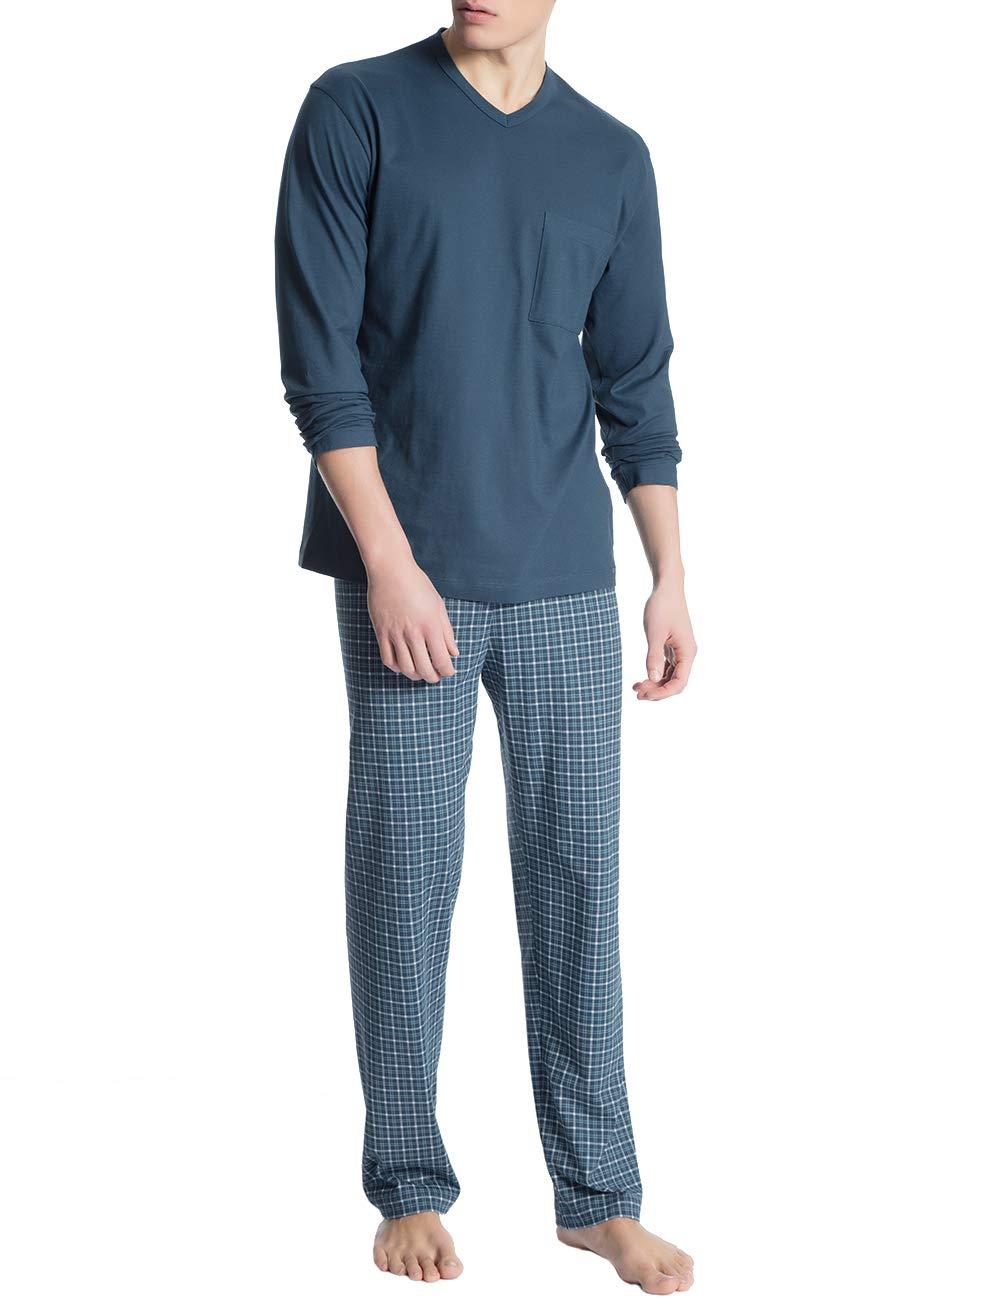 Imprint Homme Calida Wing 1 PyjamaBleublue Ensemble Relax De 517Large Teal CBoWrdxe